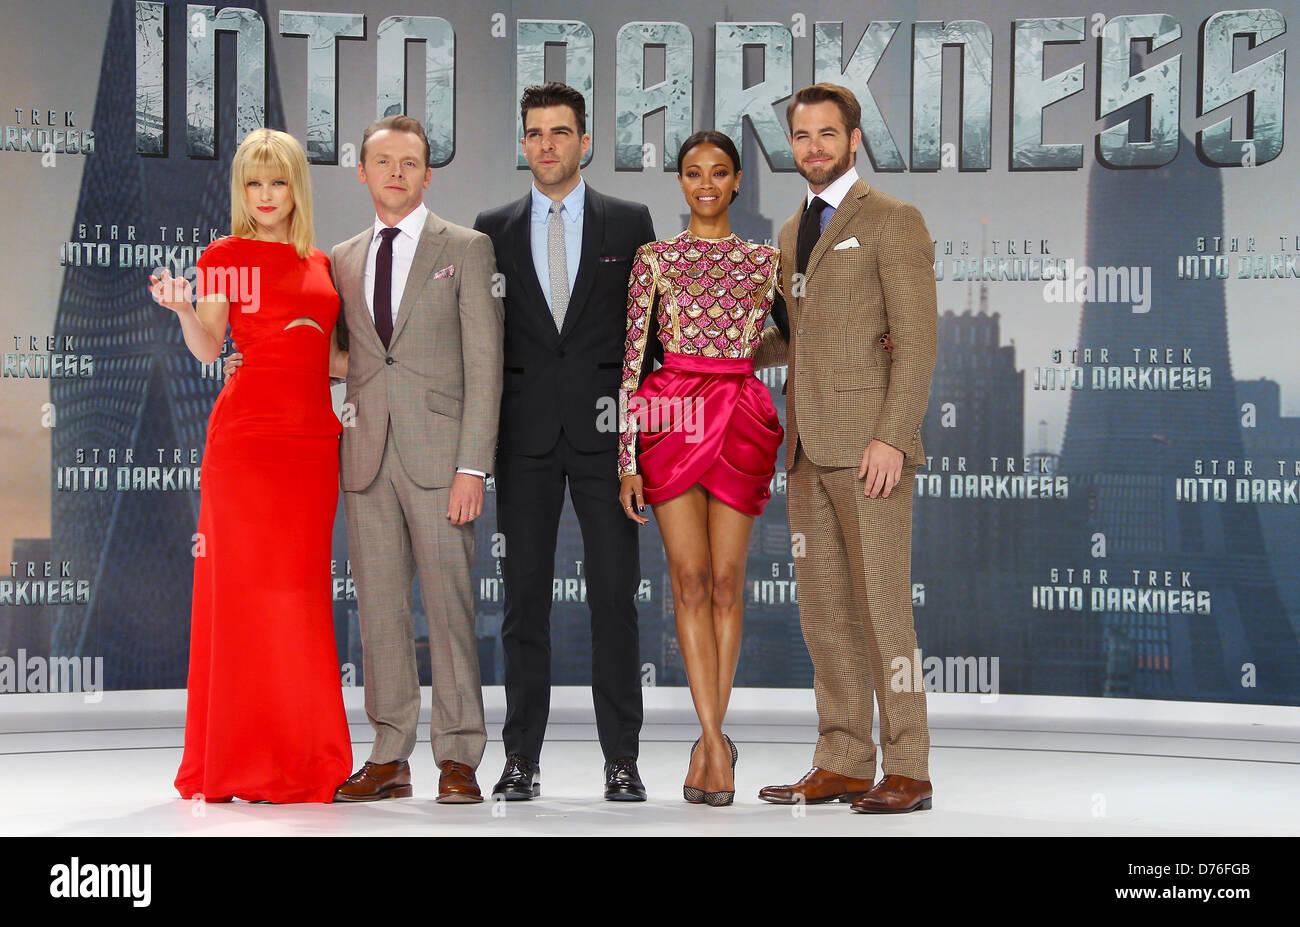 Berlin, Germany, 29 April 2013. Actors Alice Eve (R-L), Simon Pegg, Zachary Quinto, Zoe Saldana and Chris Pine pose - Stock Image